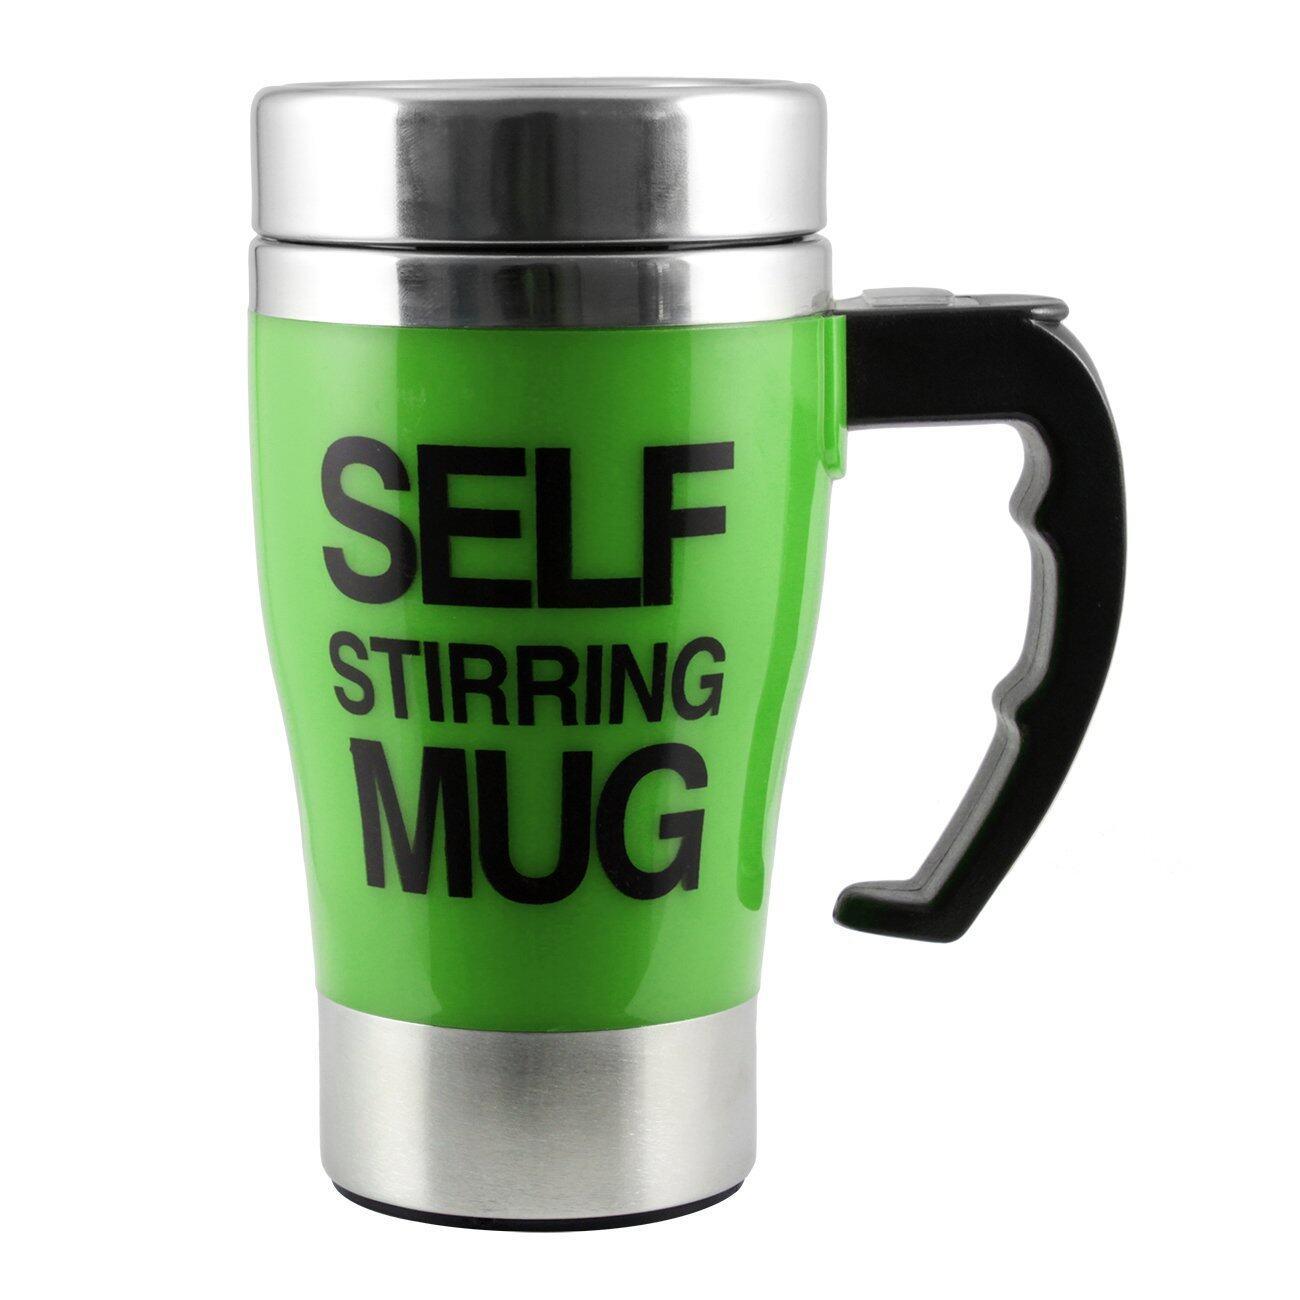 rayton Self Stirring Mug แก้วชงกาแฟอัตโนมัติ (Green)  ลดล้างสต๊อก ( สินค้ามีจำนวนจำกัดหมดเเล้วหมดเลย)